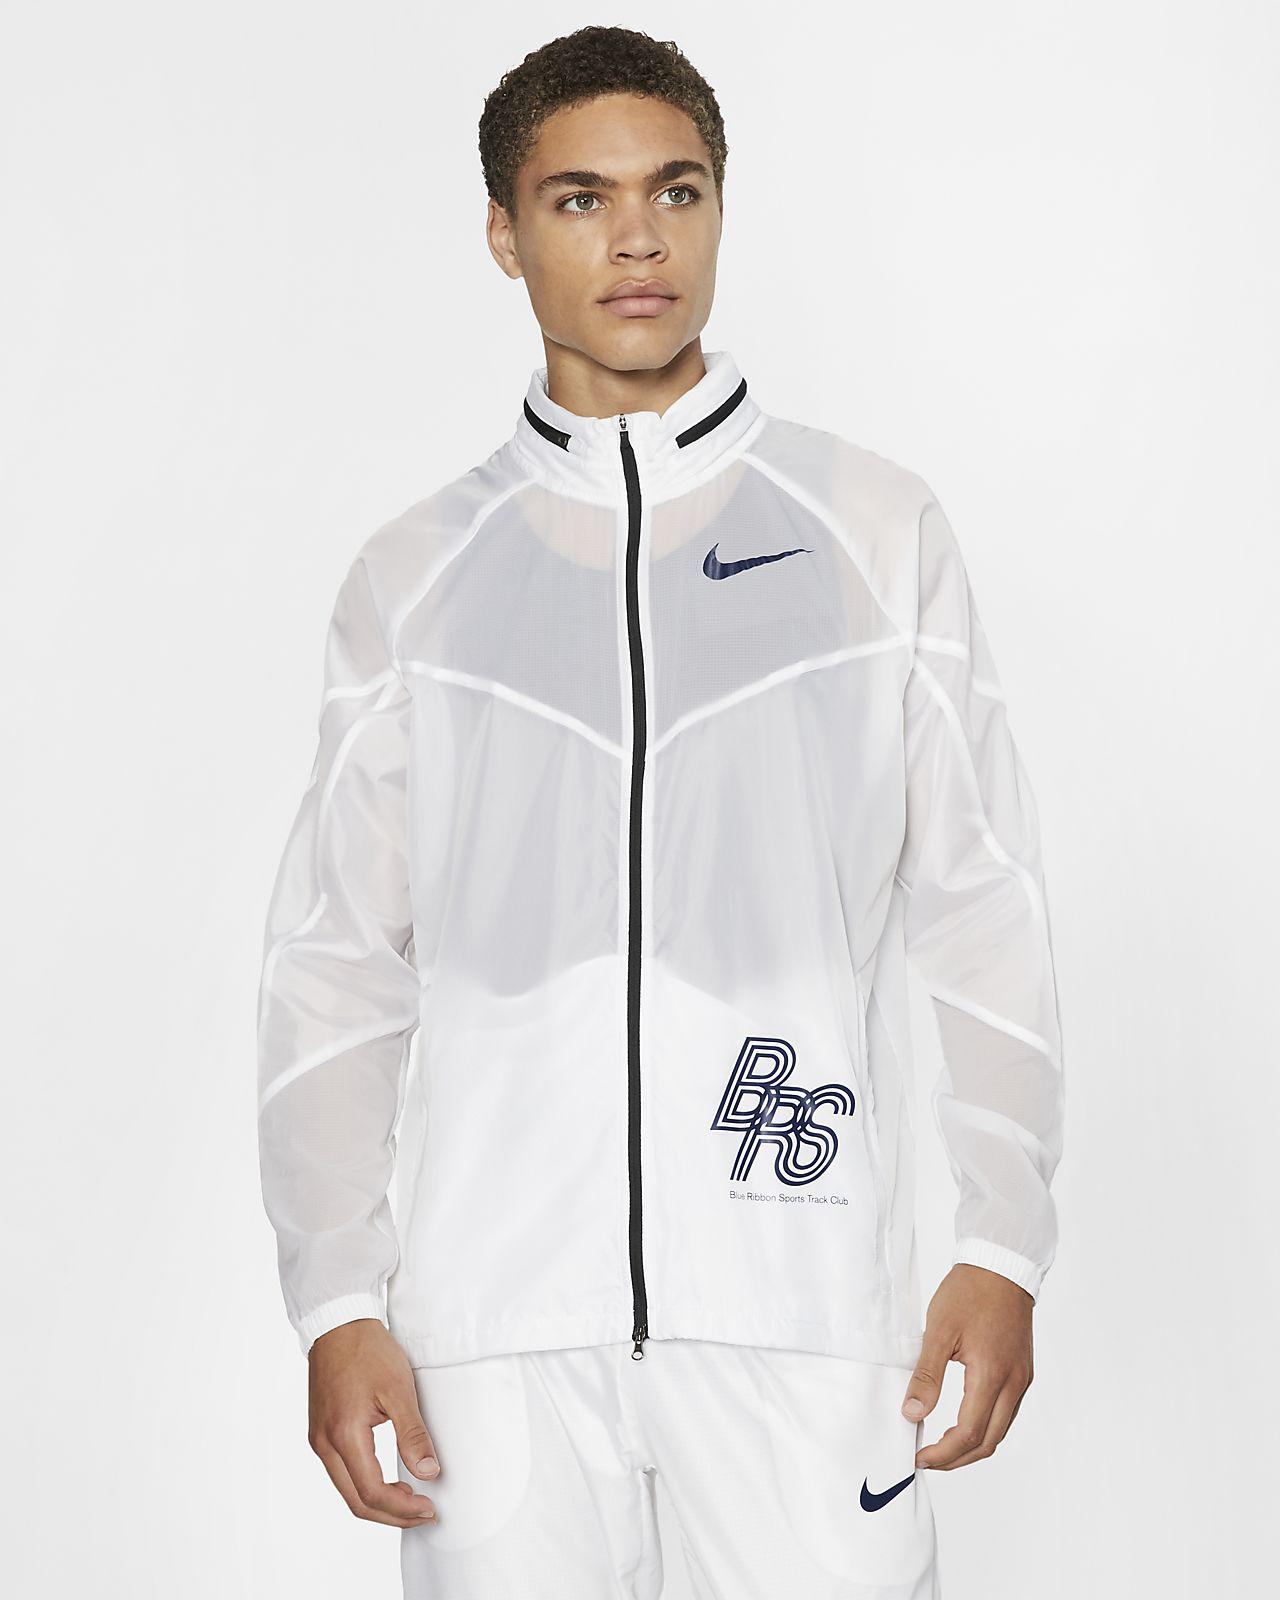 Nike BRS男/女跑步夹克